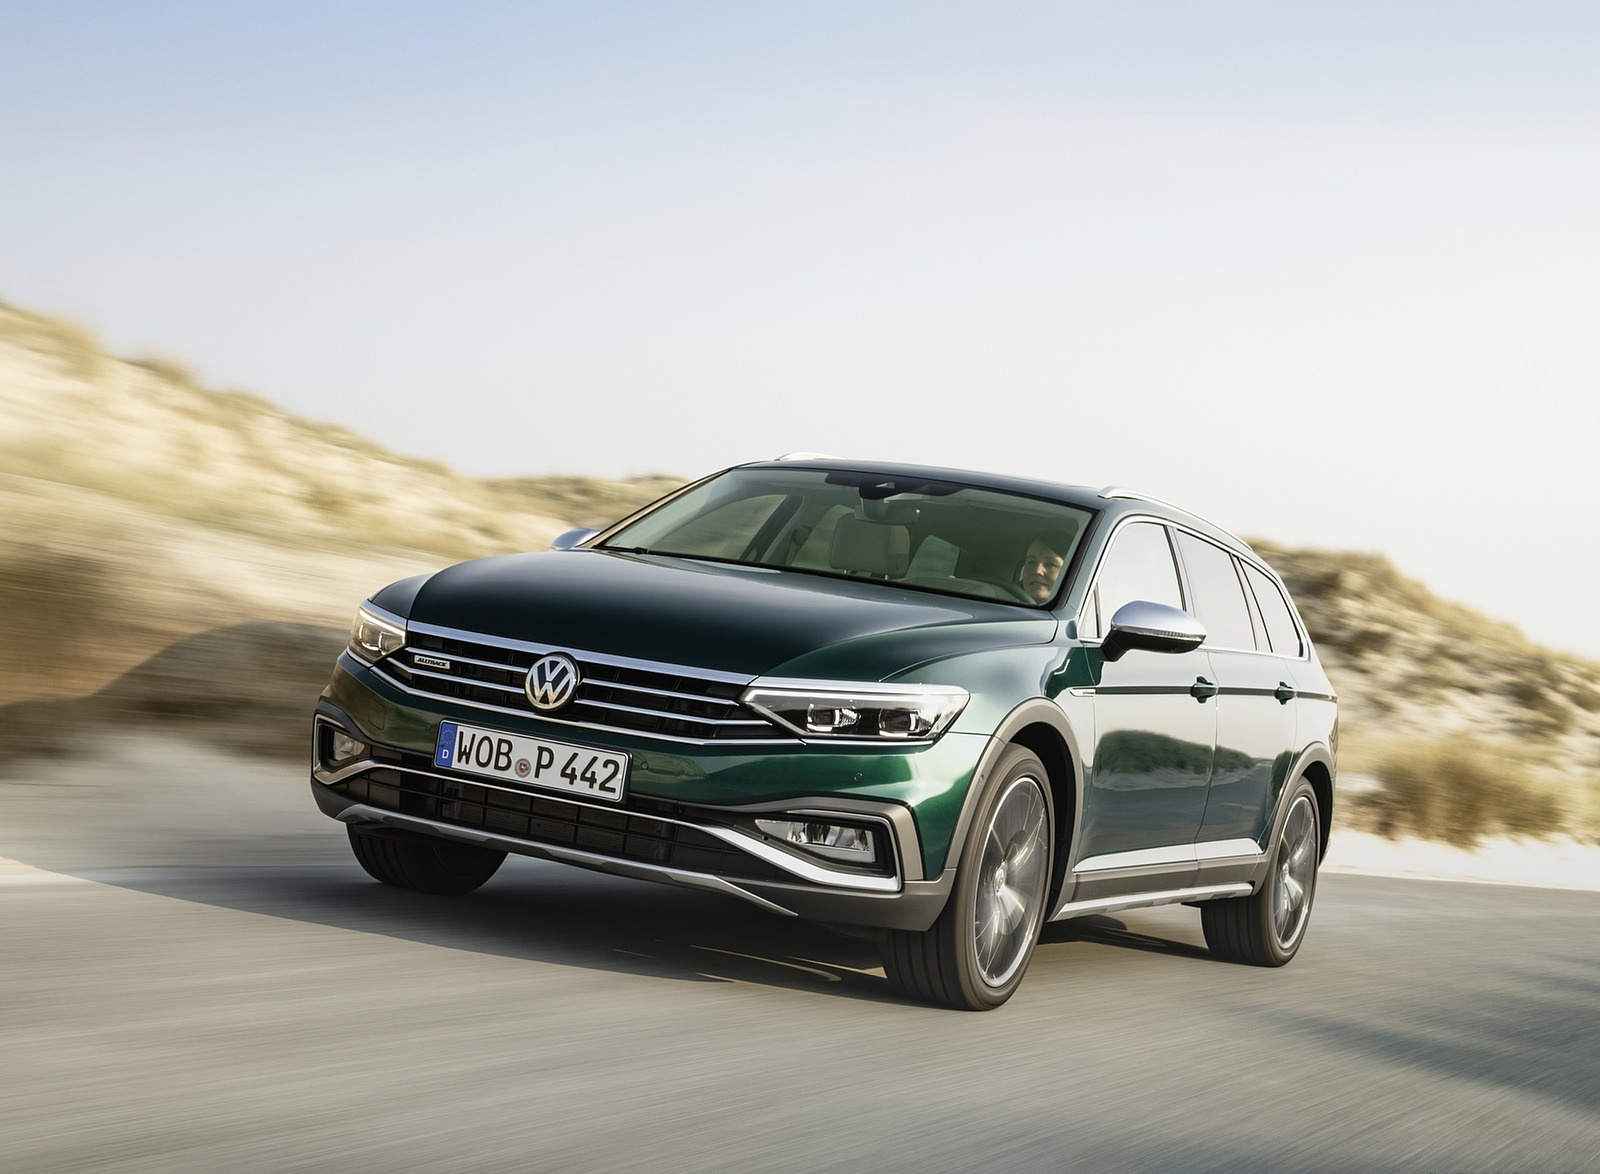 2020 Volkswagen Passat Alltrack (EU-Spec) Front Three-Quarter Wallpapers (6)